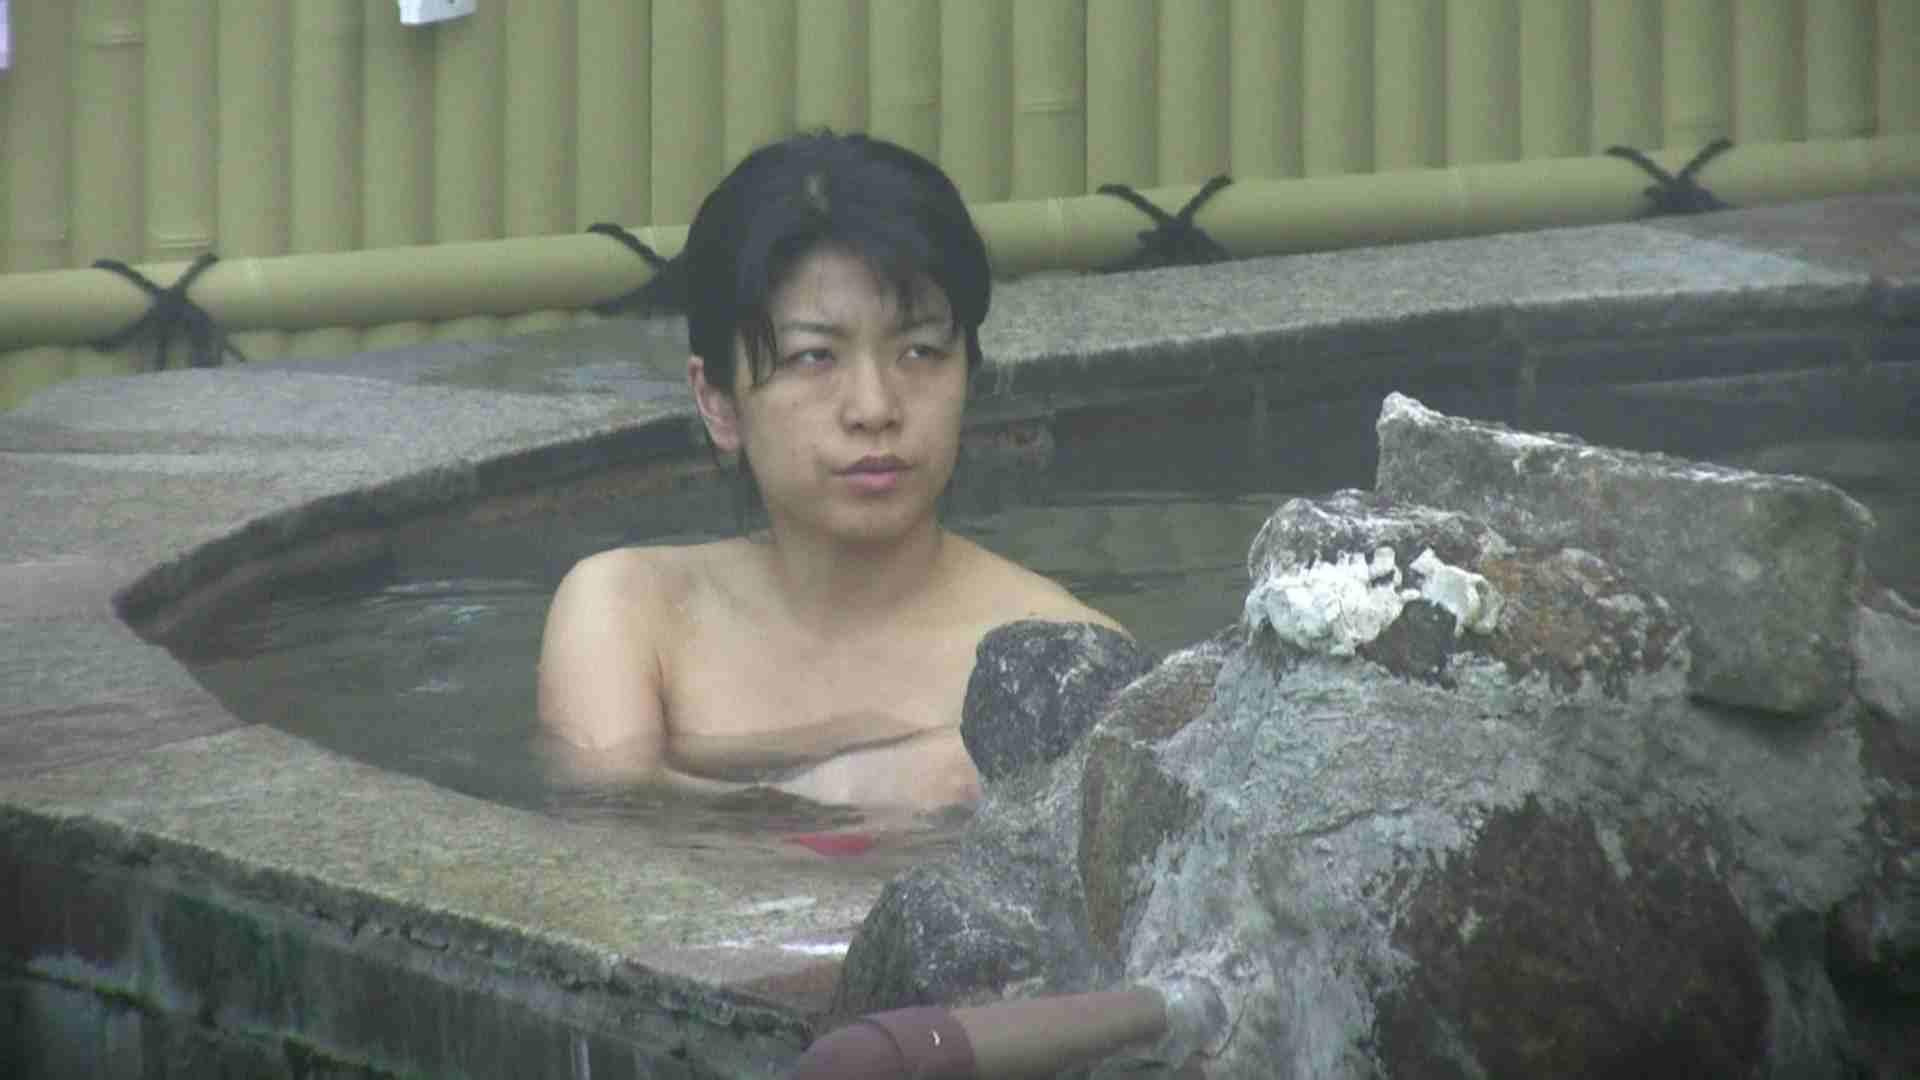 Aquaな露天風呂Vol.585 盗撮 | OLエロ画像  78PICs 13